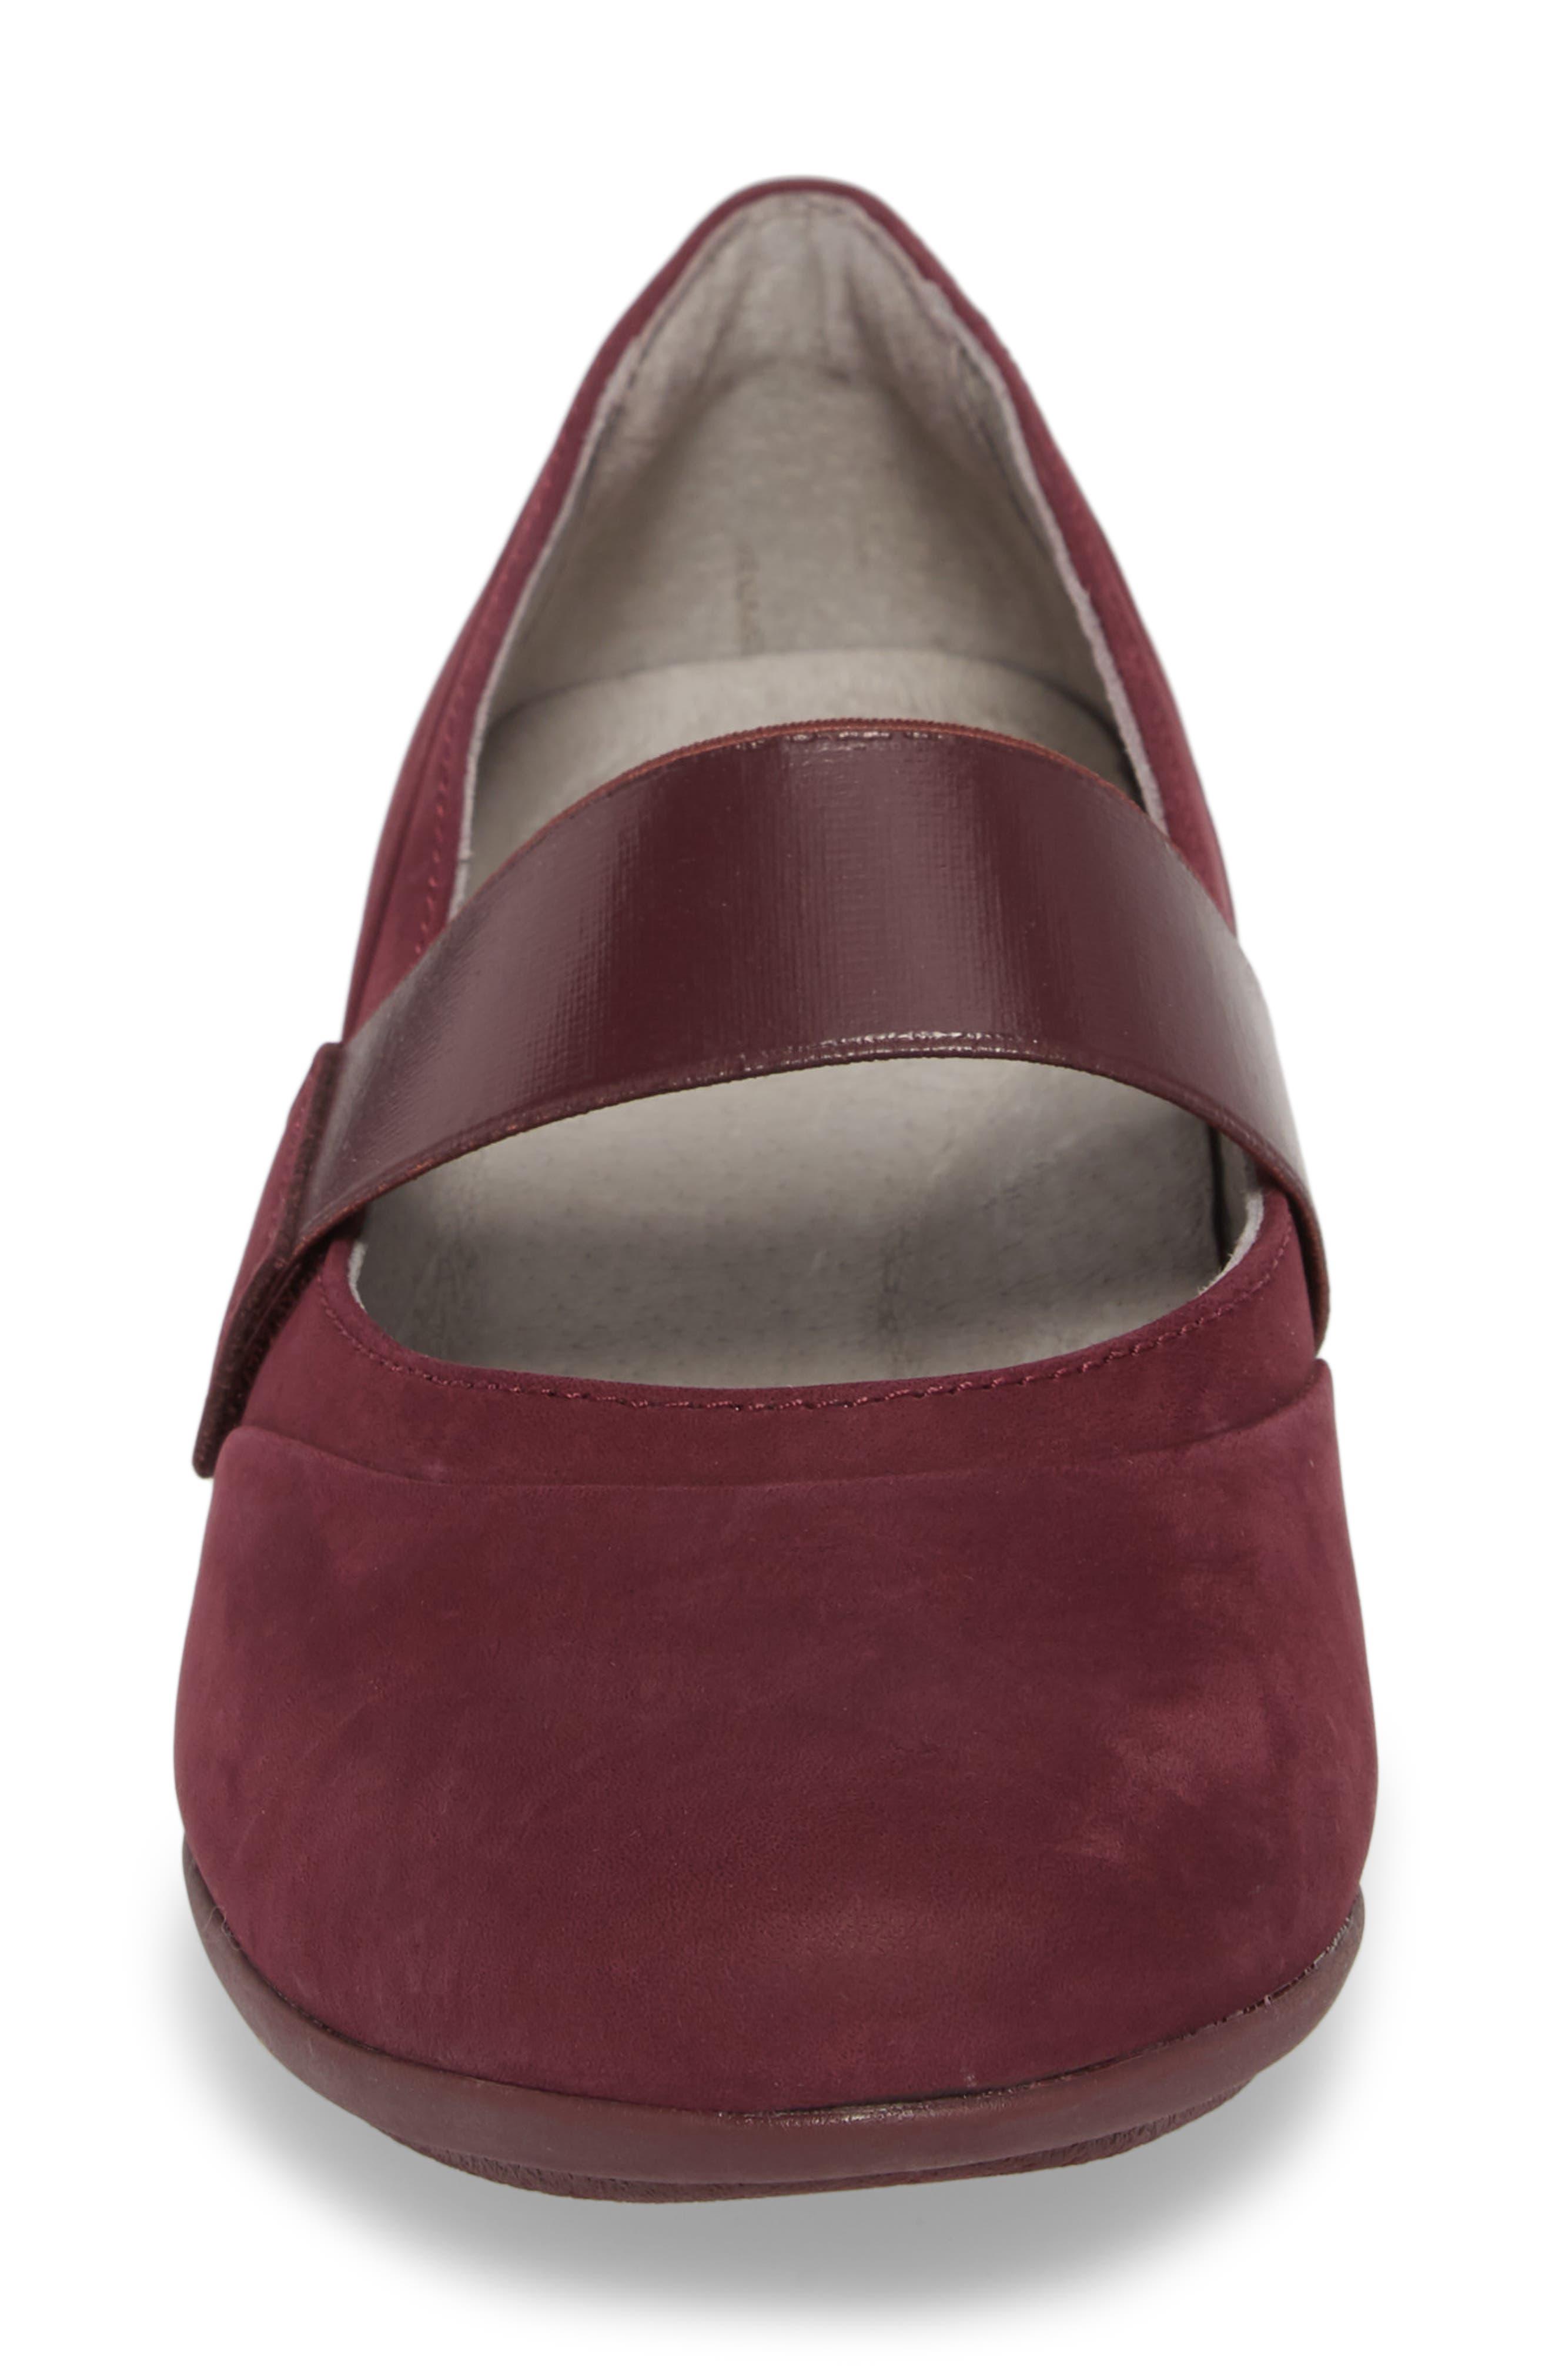 Kendra Mary Jane Wedge,                             Alternate thumbnail 3, color,                             Wine Milled Nubuck Leather